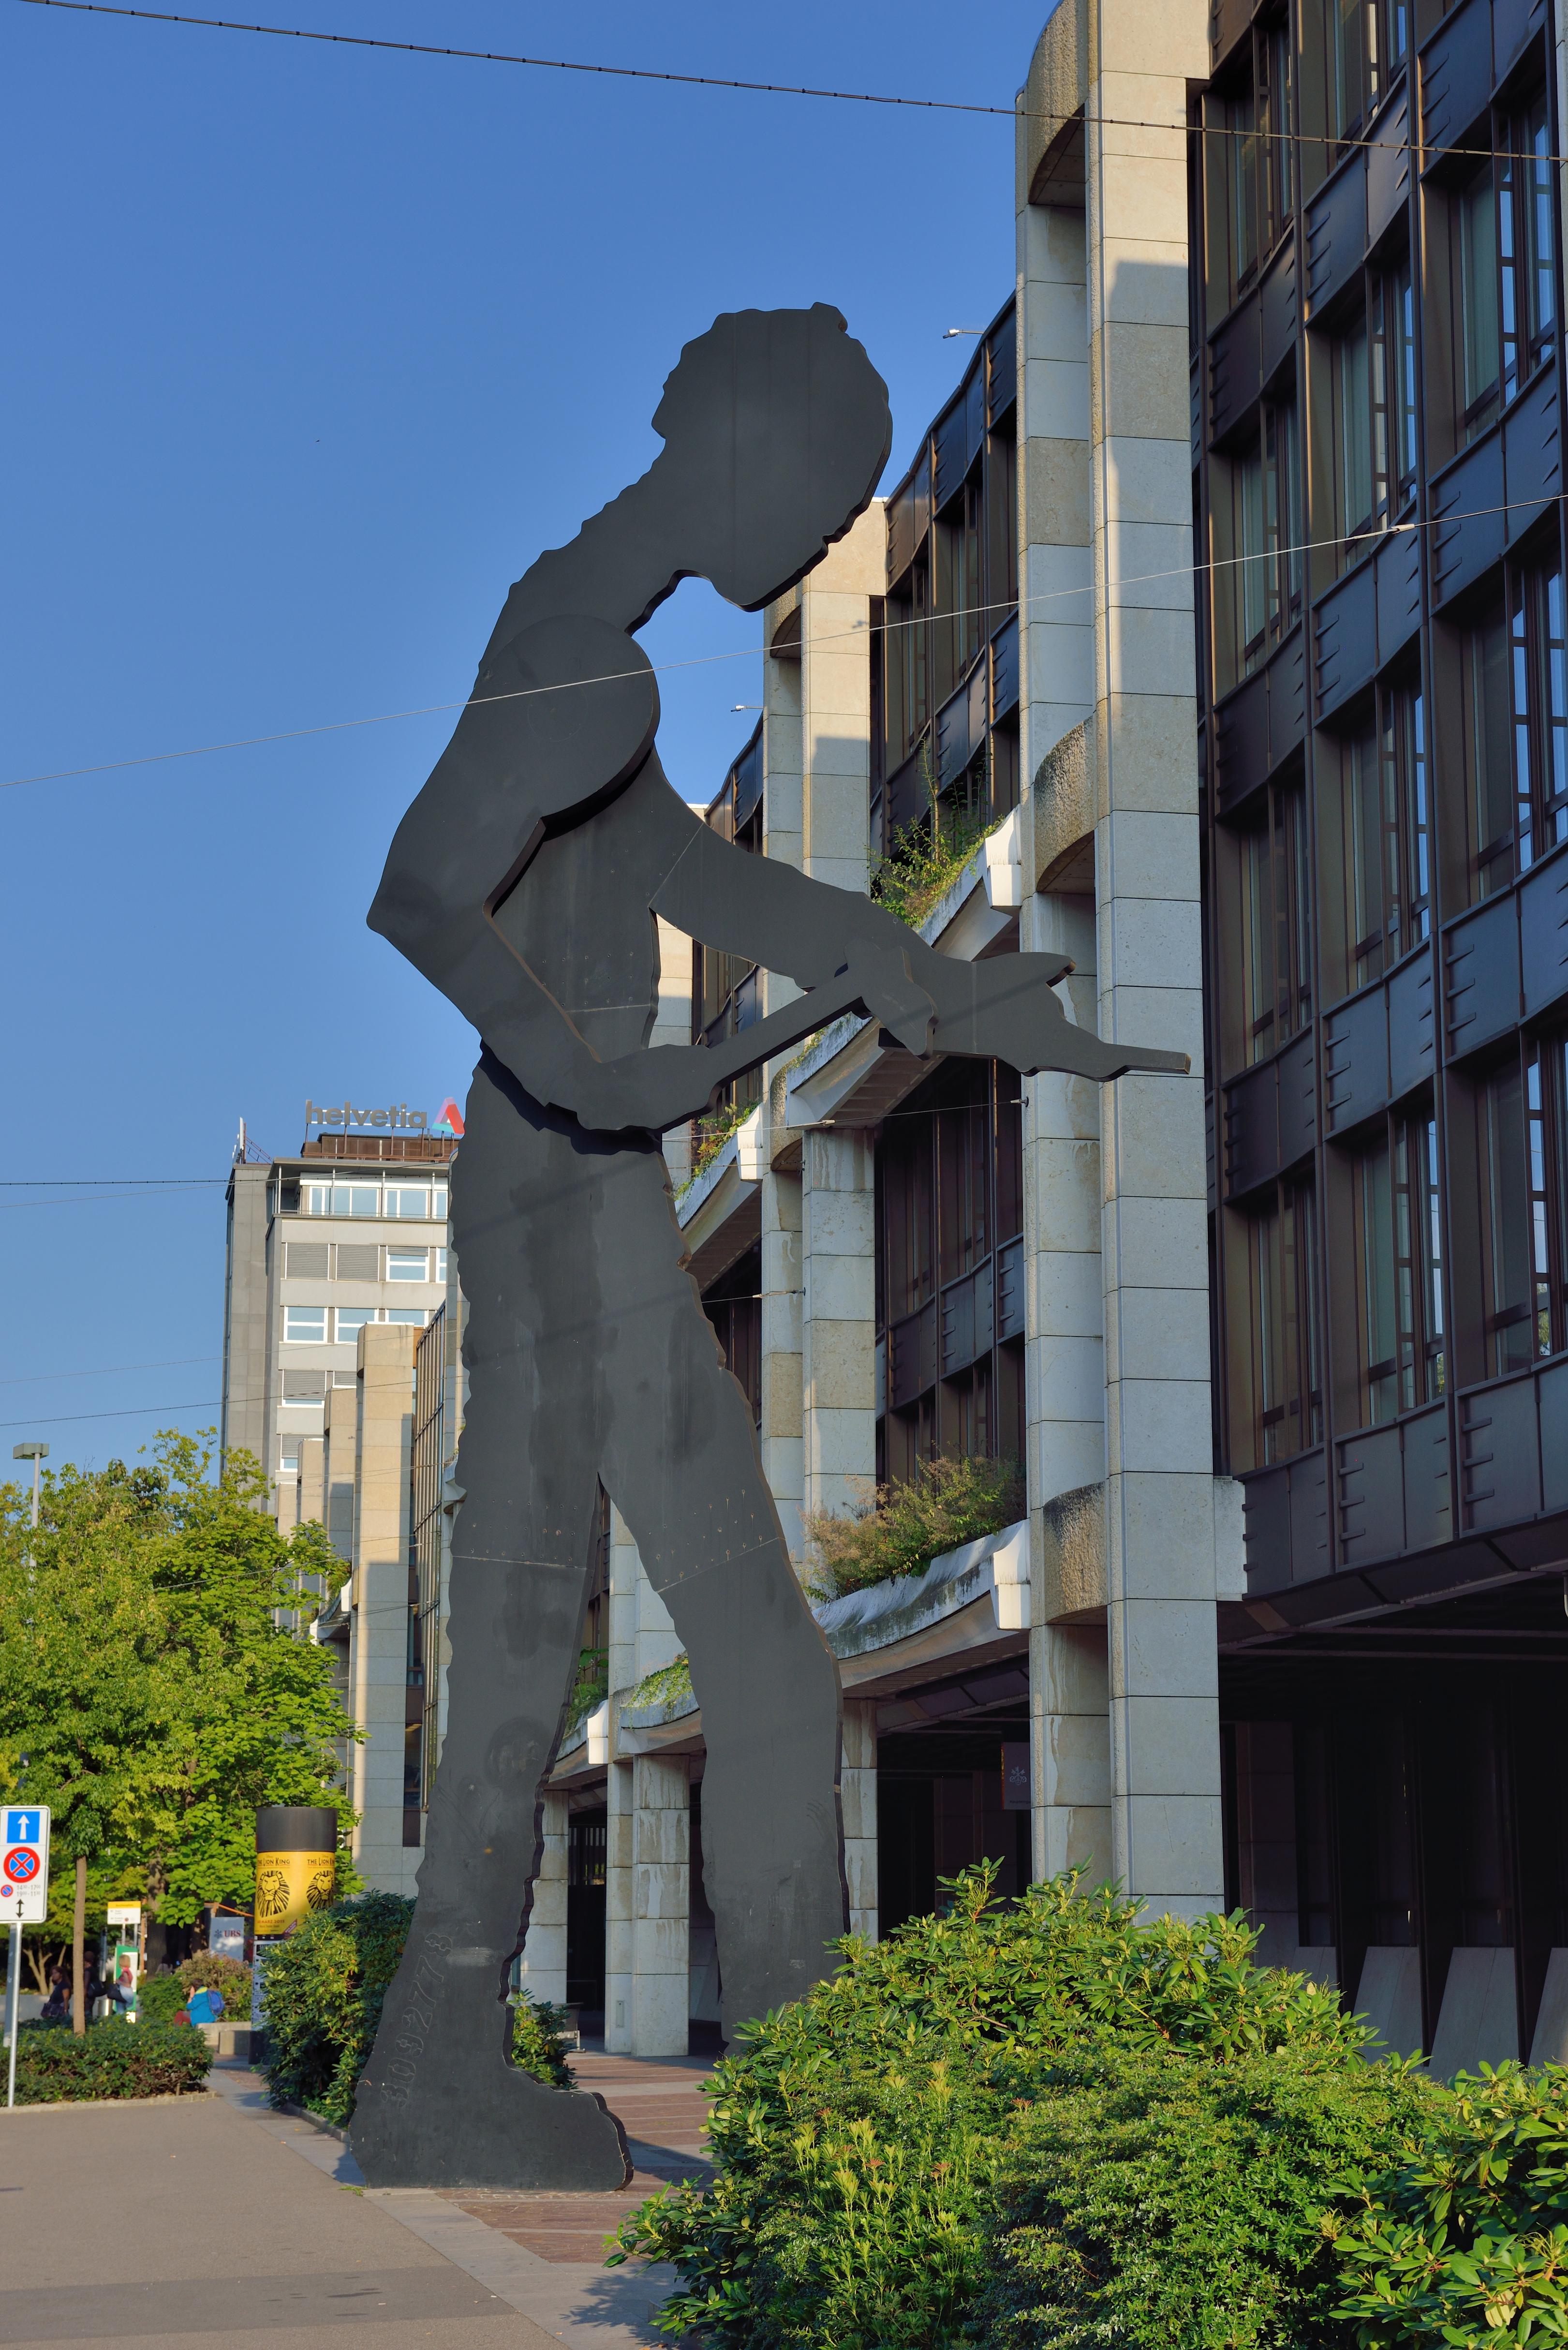 https://upload.wikimedia.org/wikipedia/commons/c/cd/Basel_-_Hammering_Man.jpg